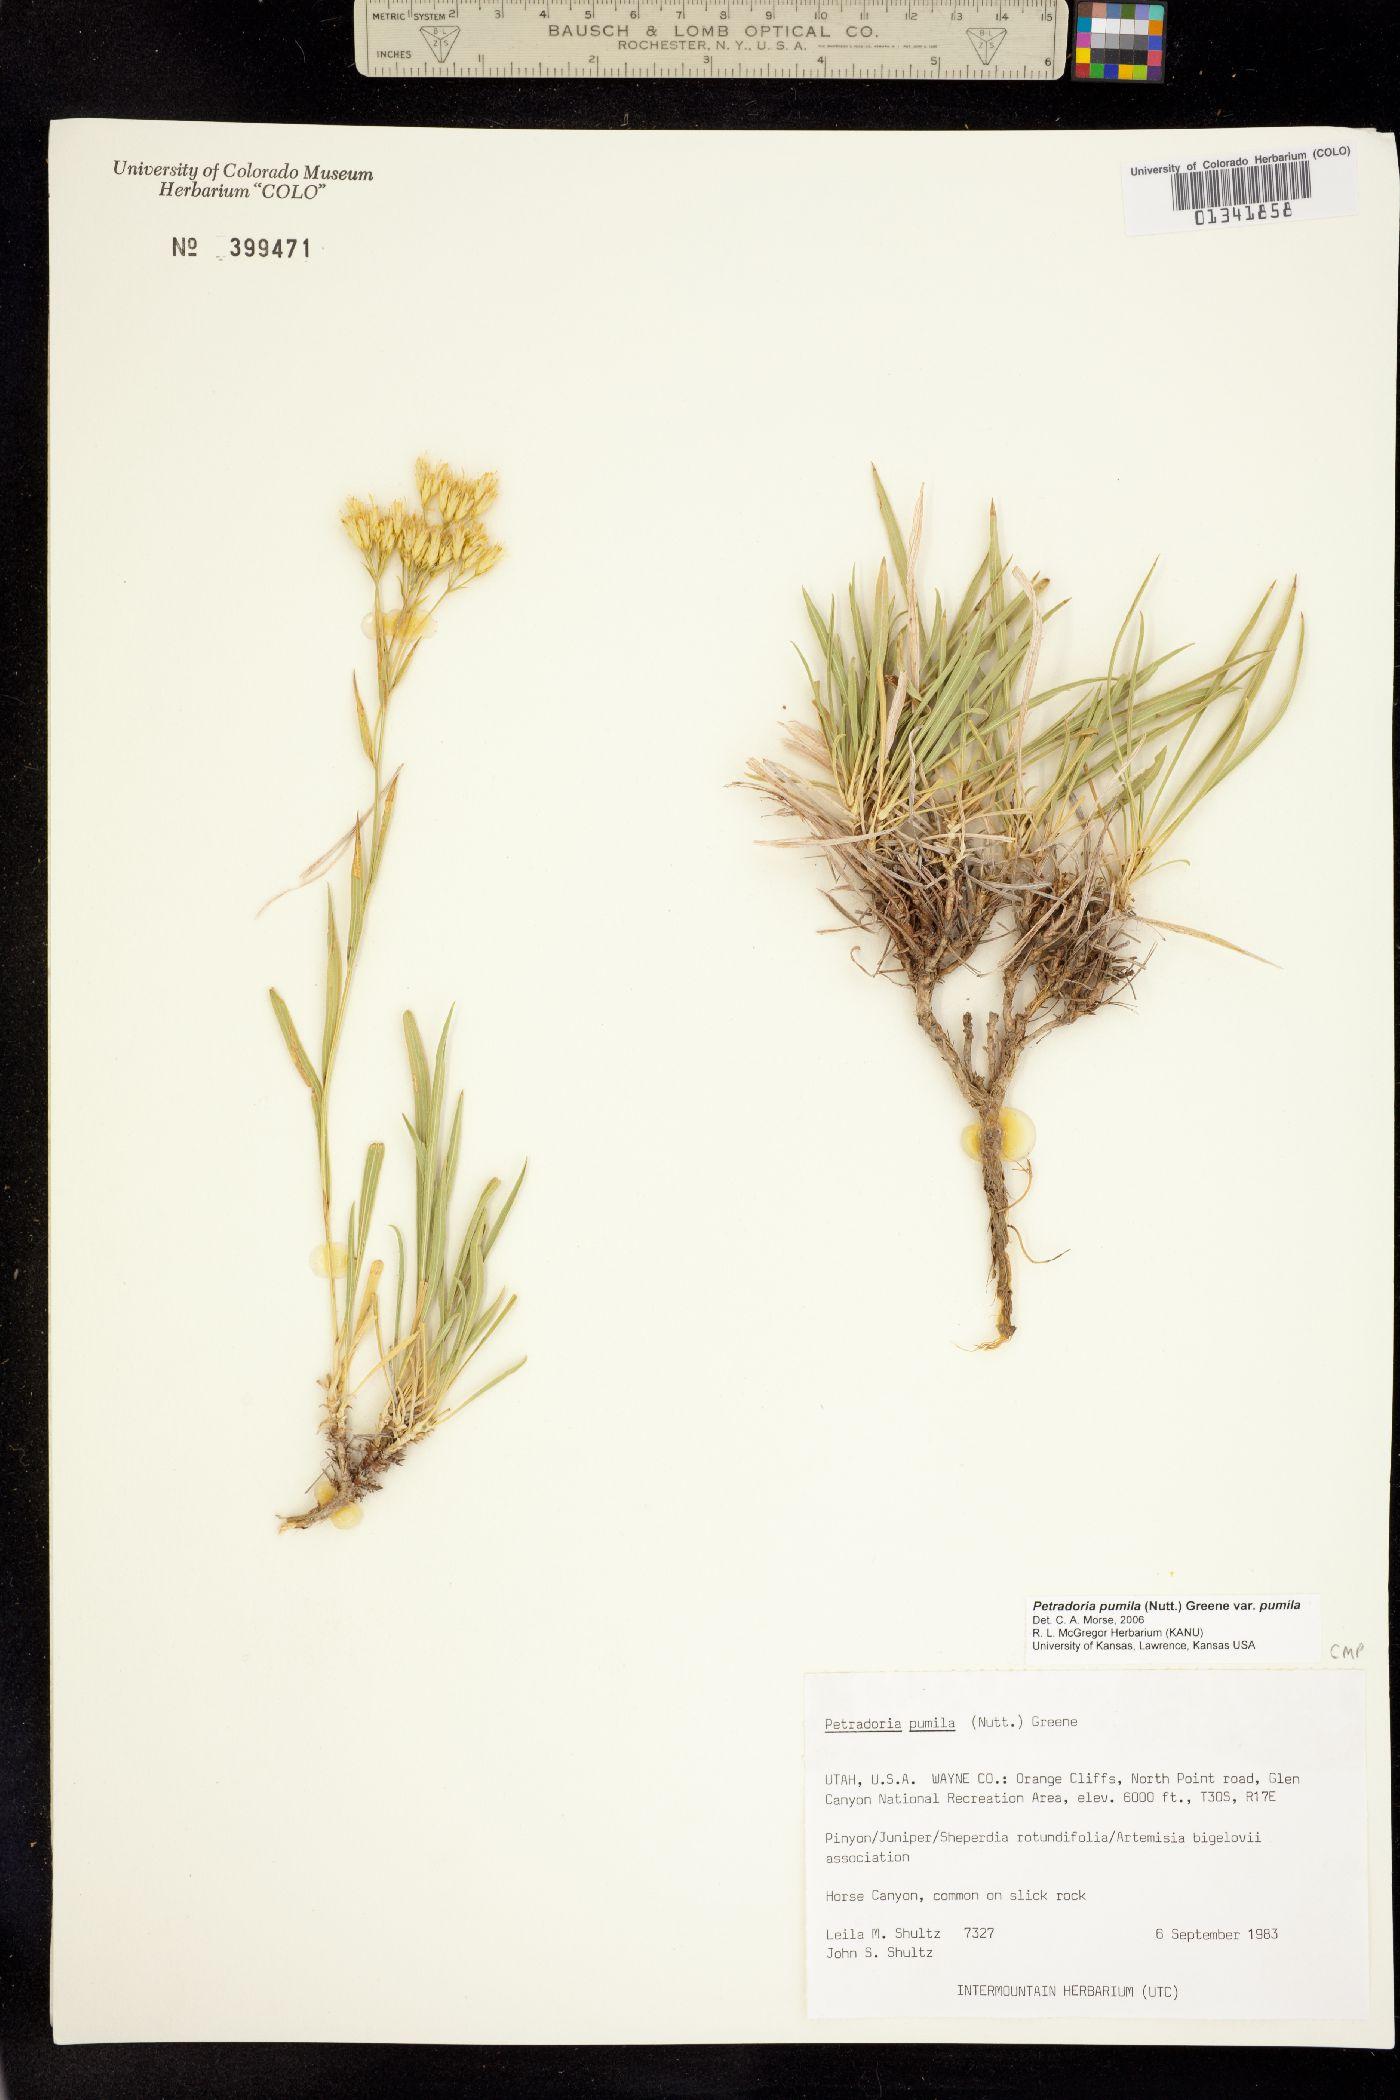 Petradoria pumila ssp. pumila image